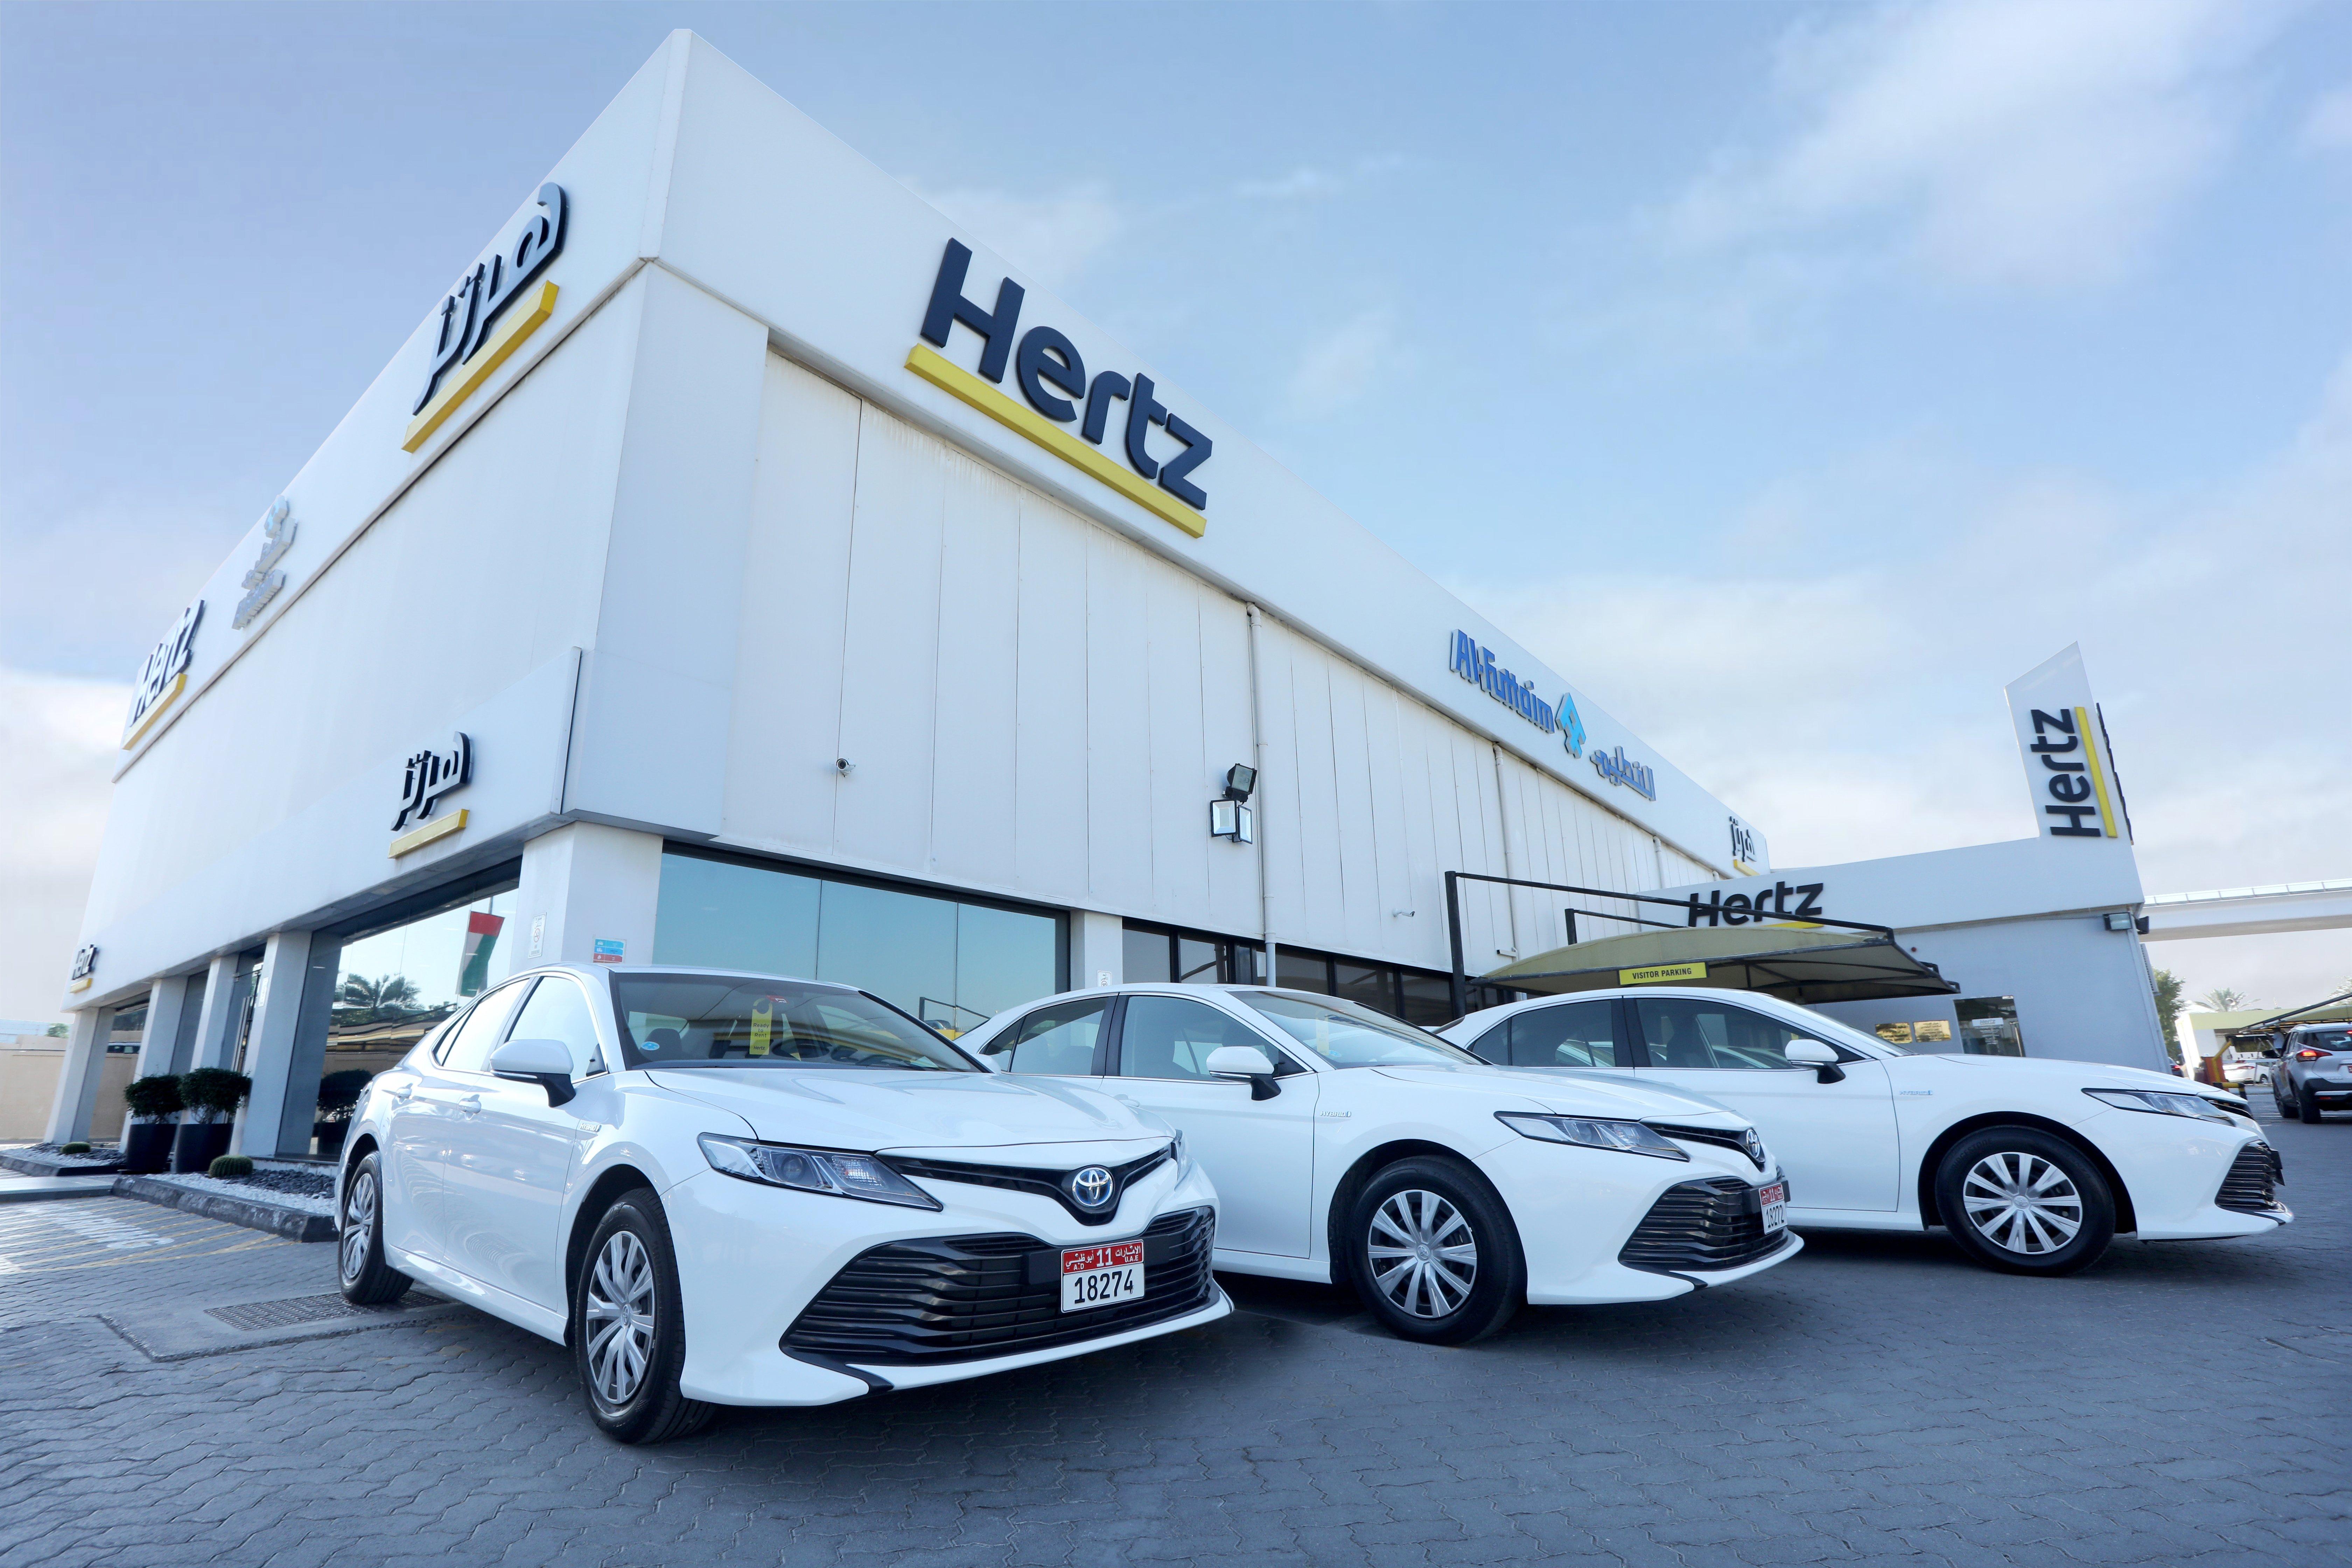 Hertiz UAE Hybrid Electric Fleet